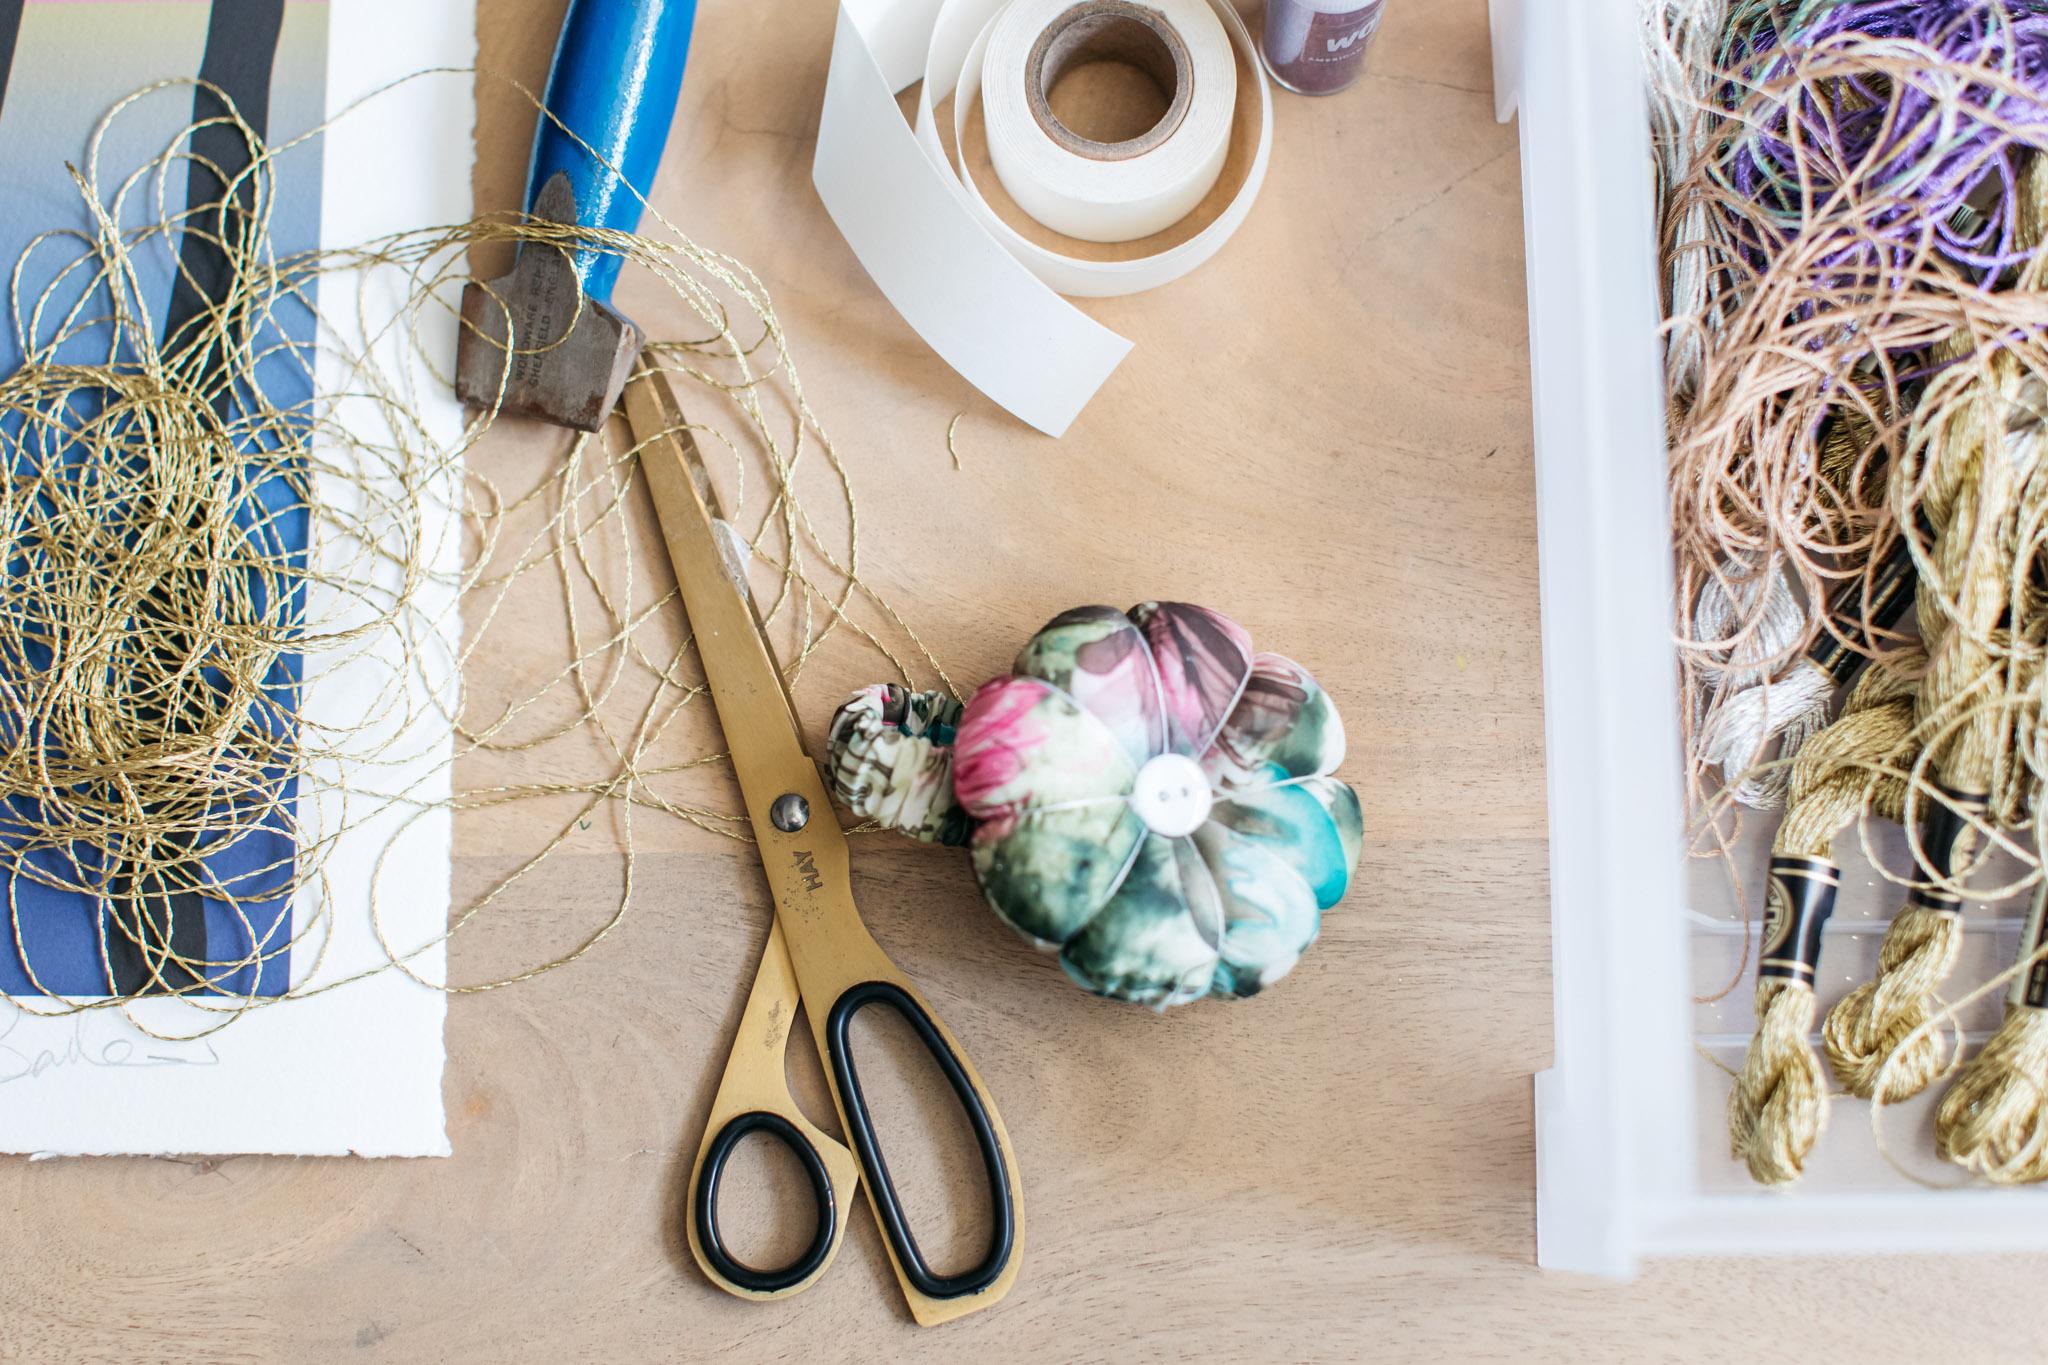 artist-brighton-studio-handmade